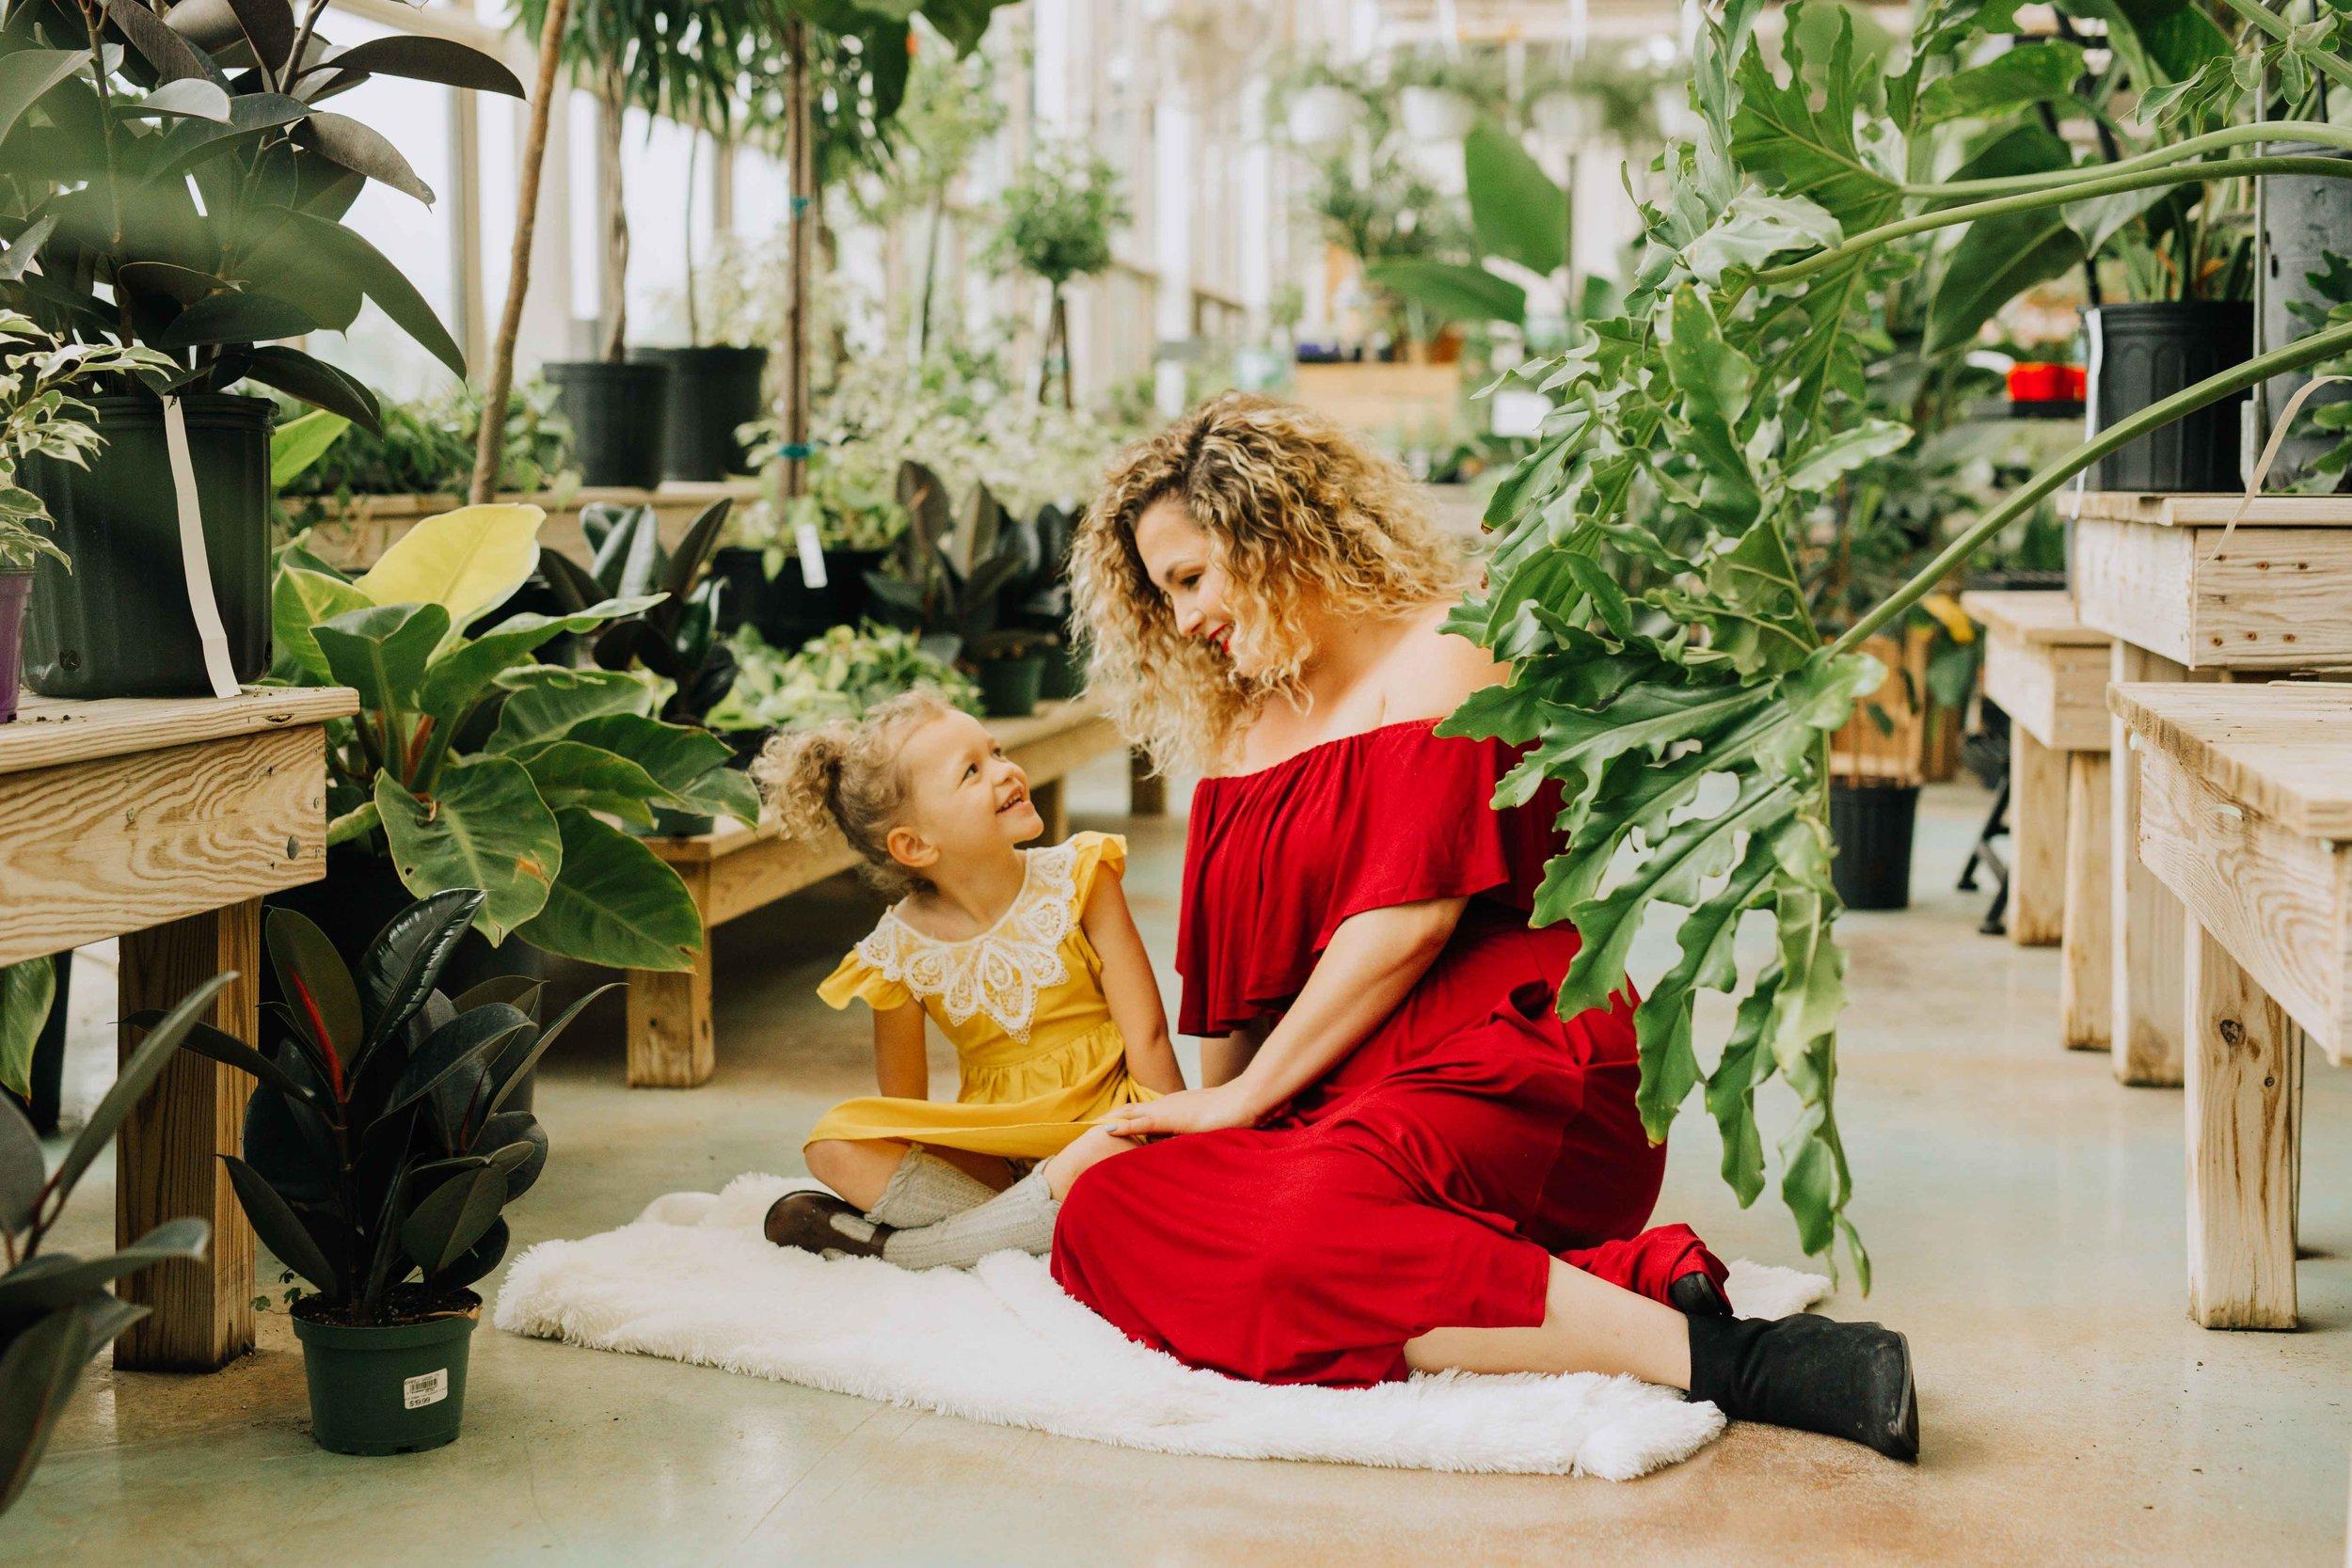 Merrifield-garden-greenhouse-indoor-Jacqueline-Waters-Photography-Red-dress-family- (104).jpg